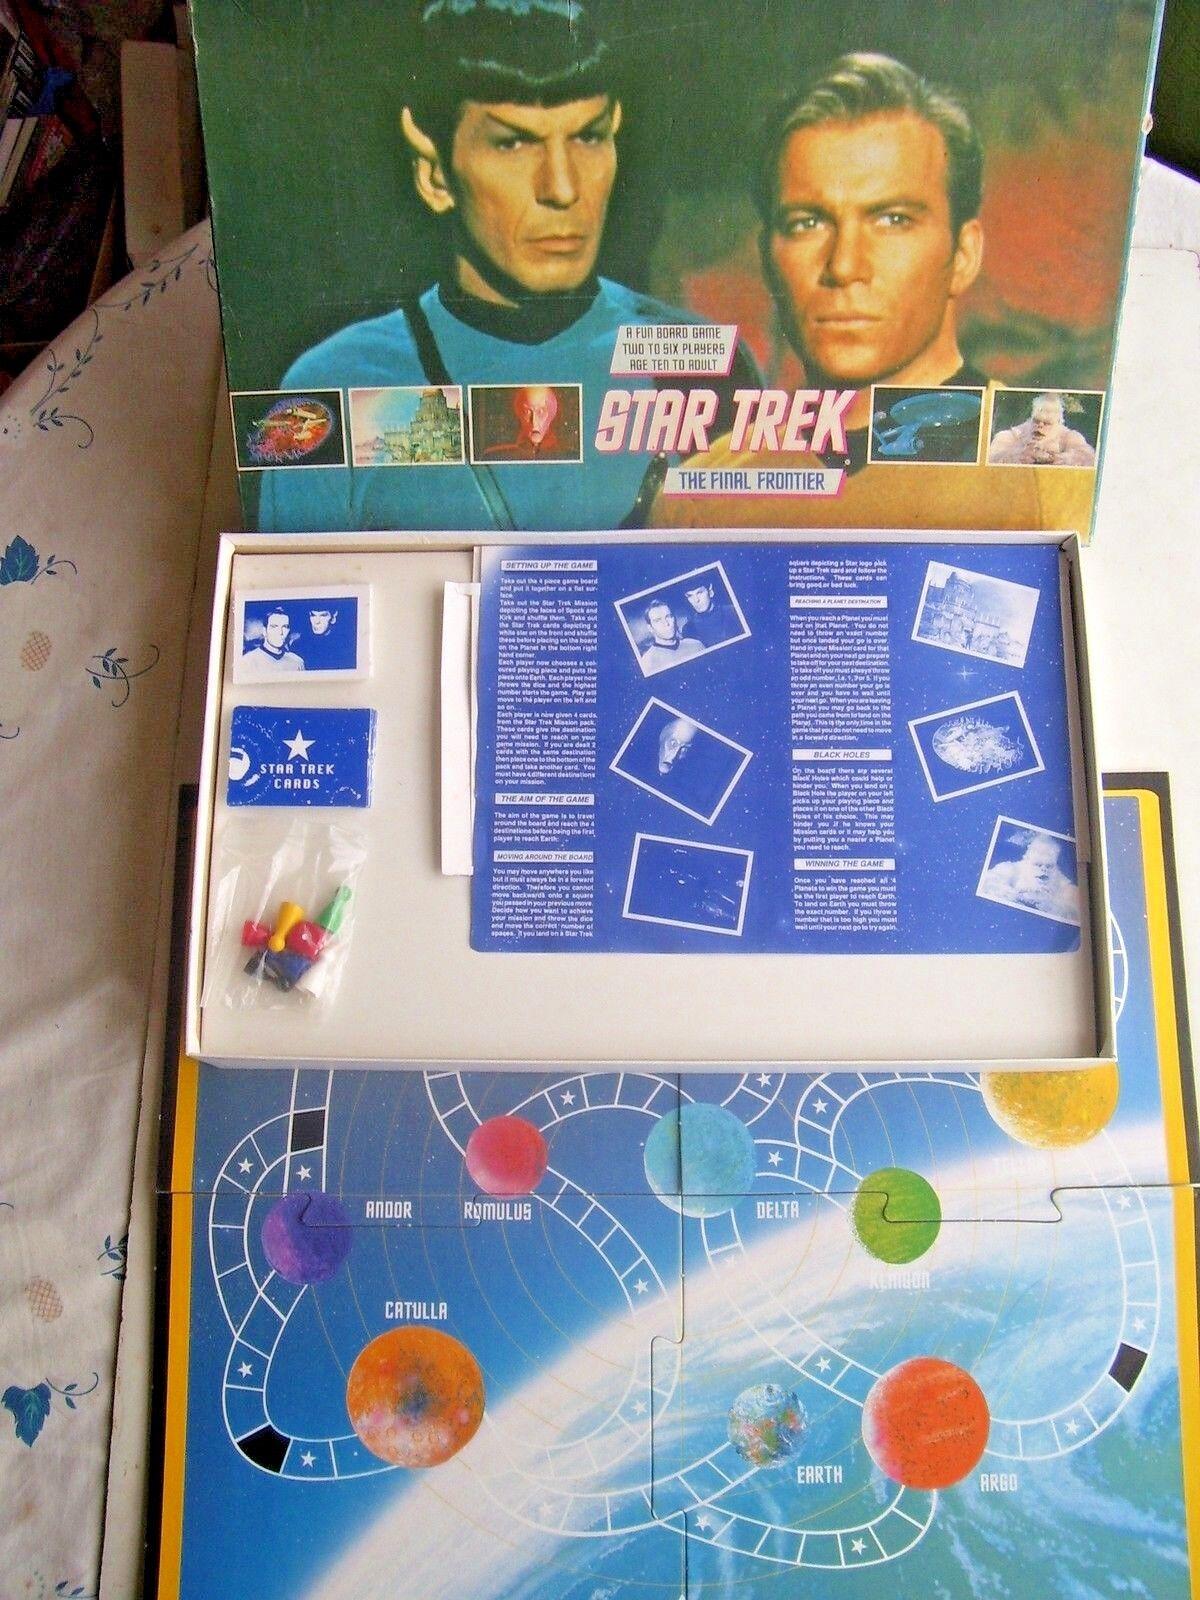 Star Trek The Final Frontier  by BMI 1992